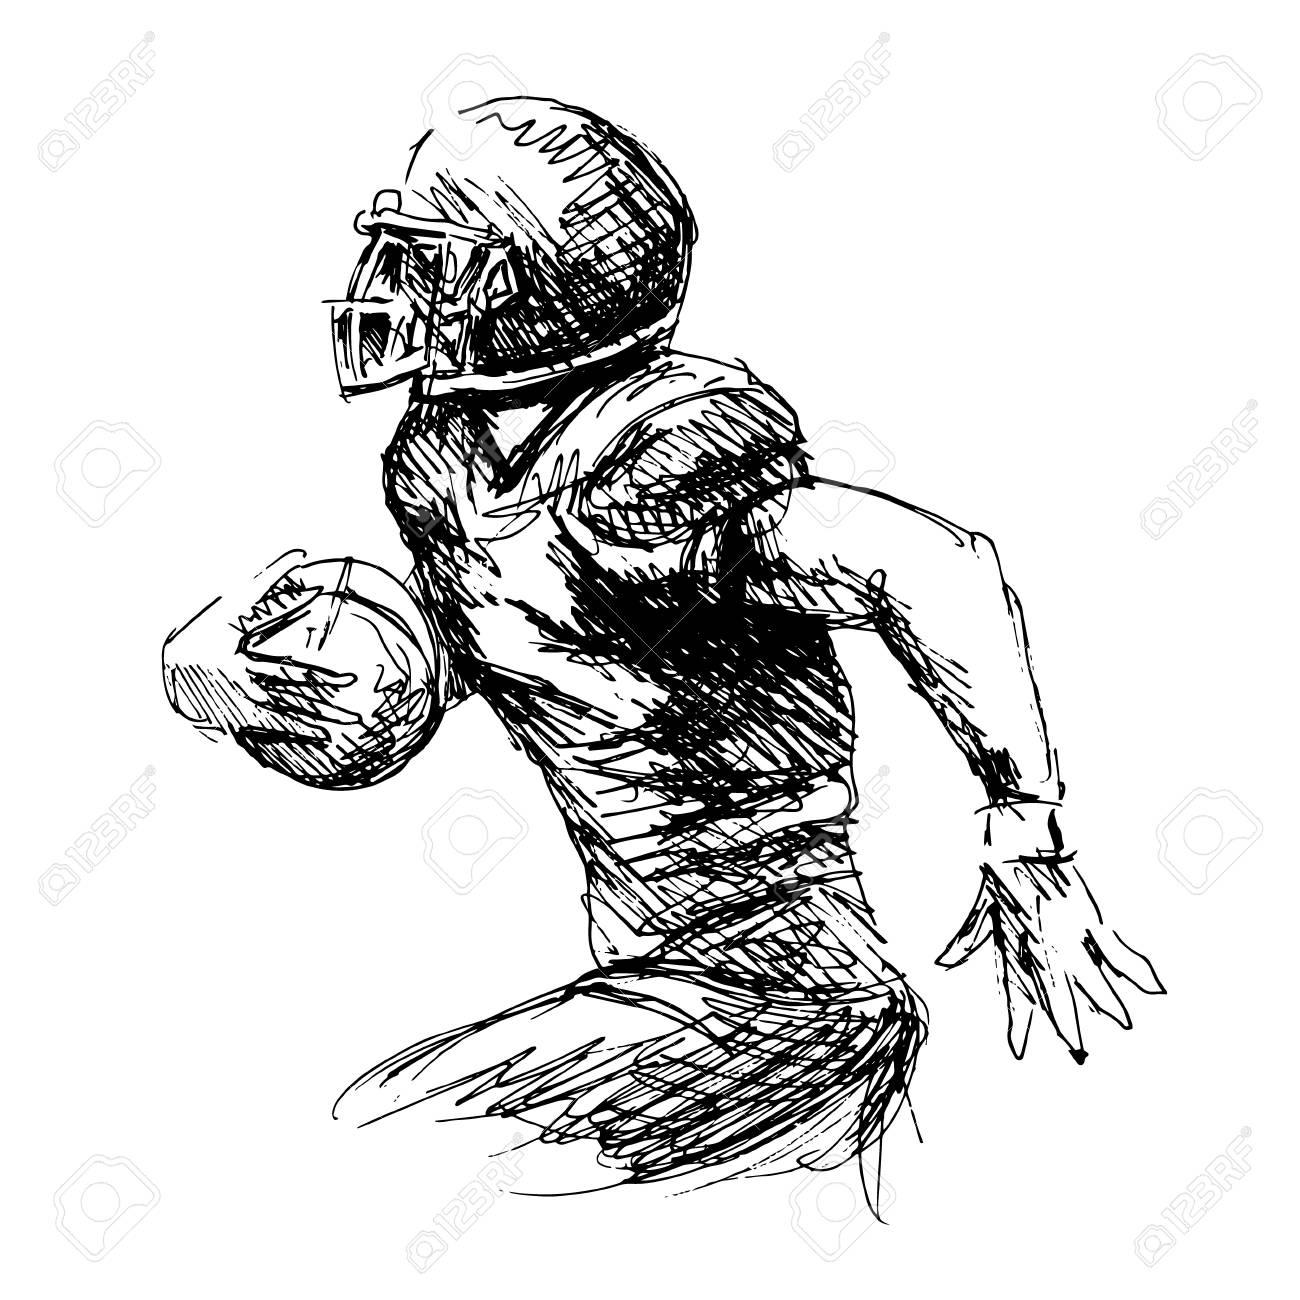 Hand Sketch American Football Player Illustration  Royalty Free